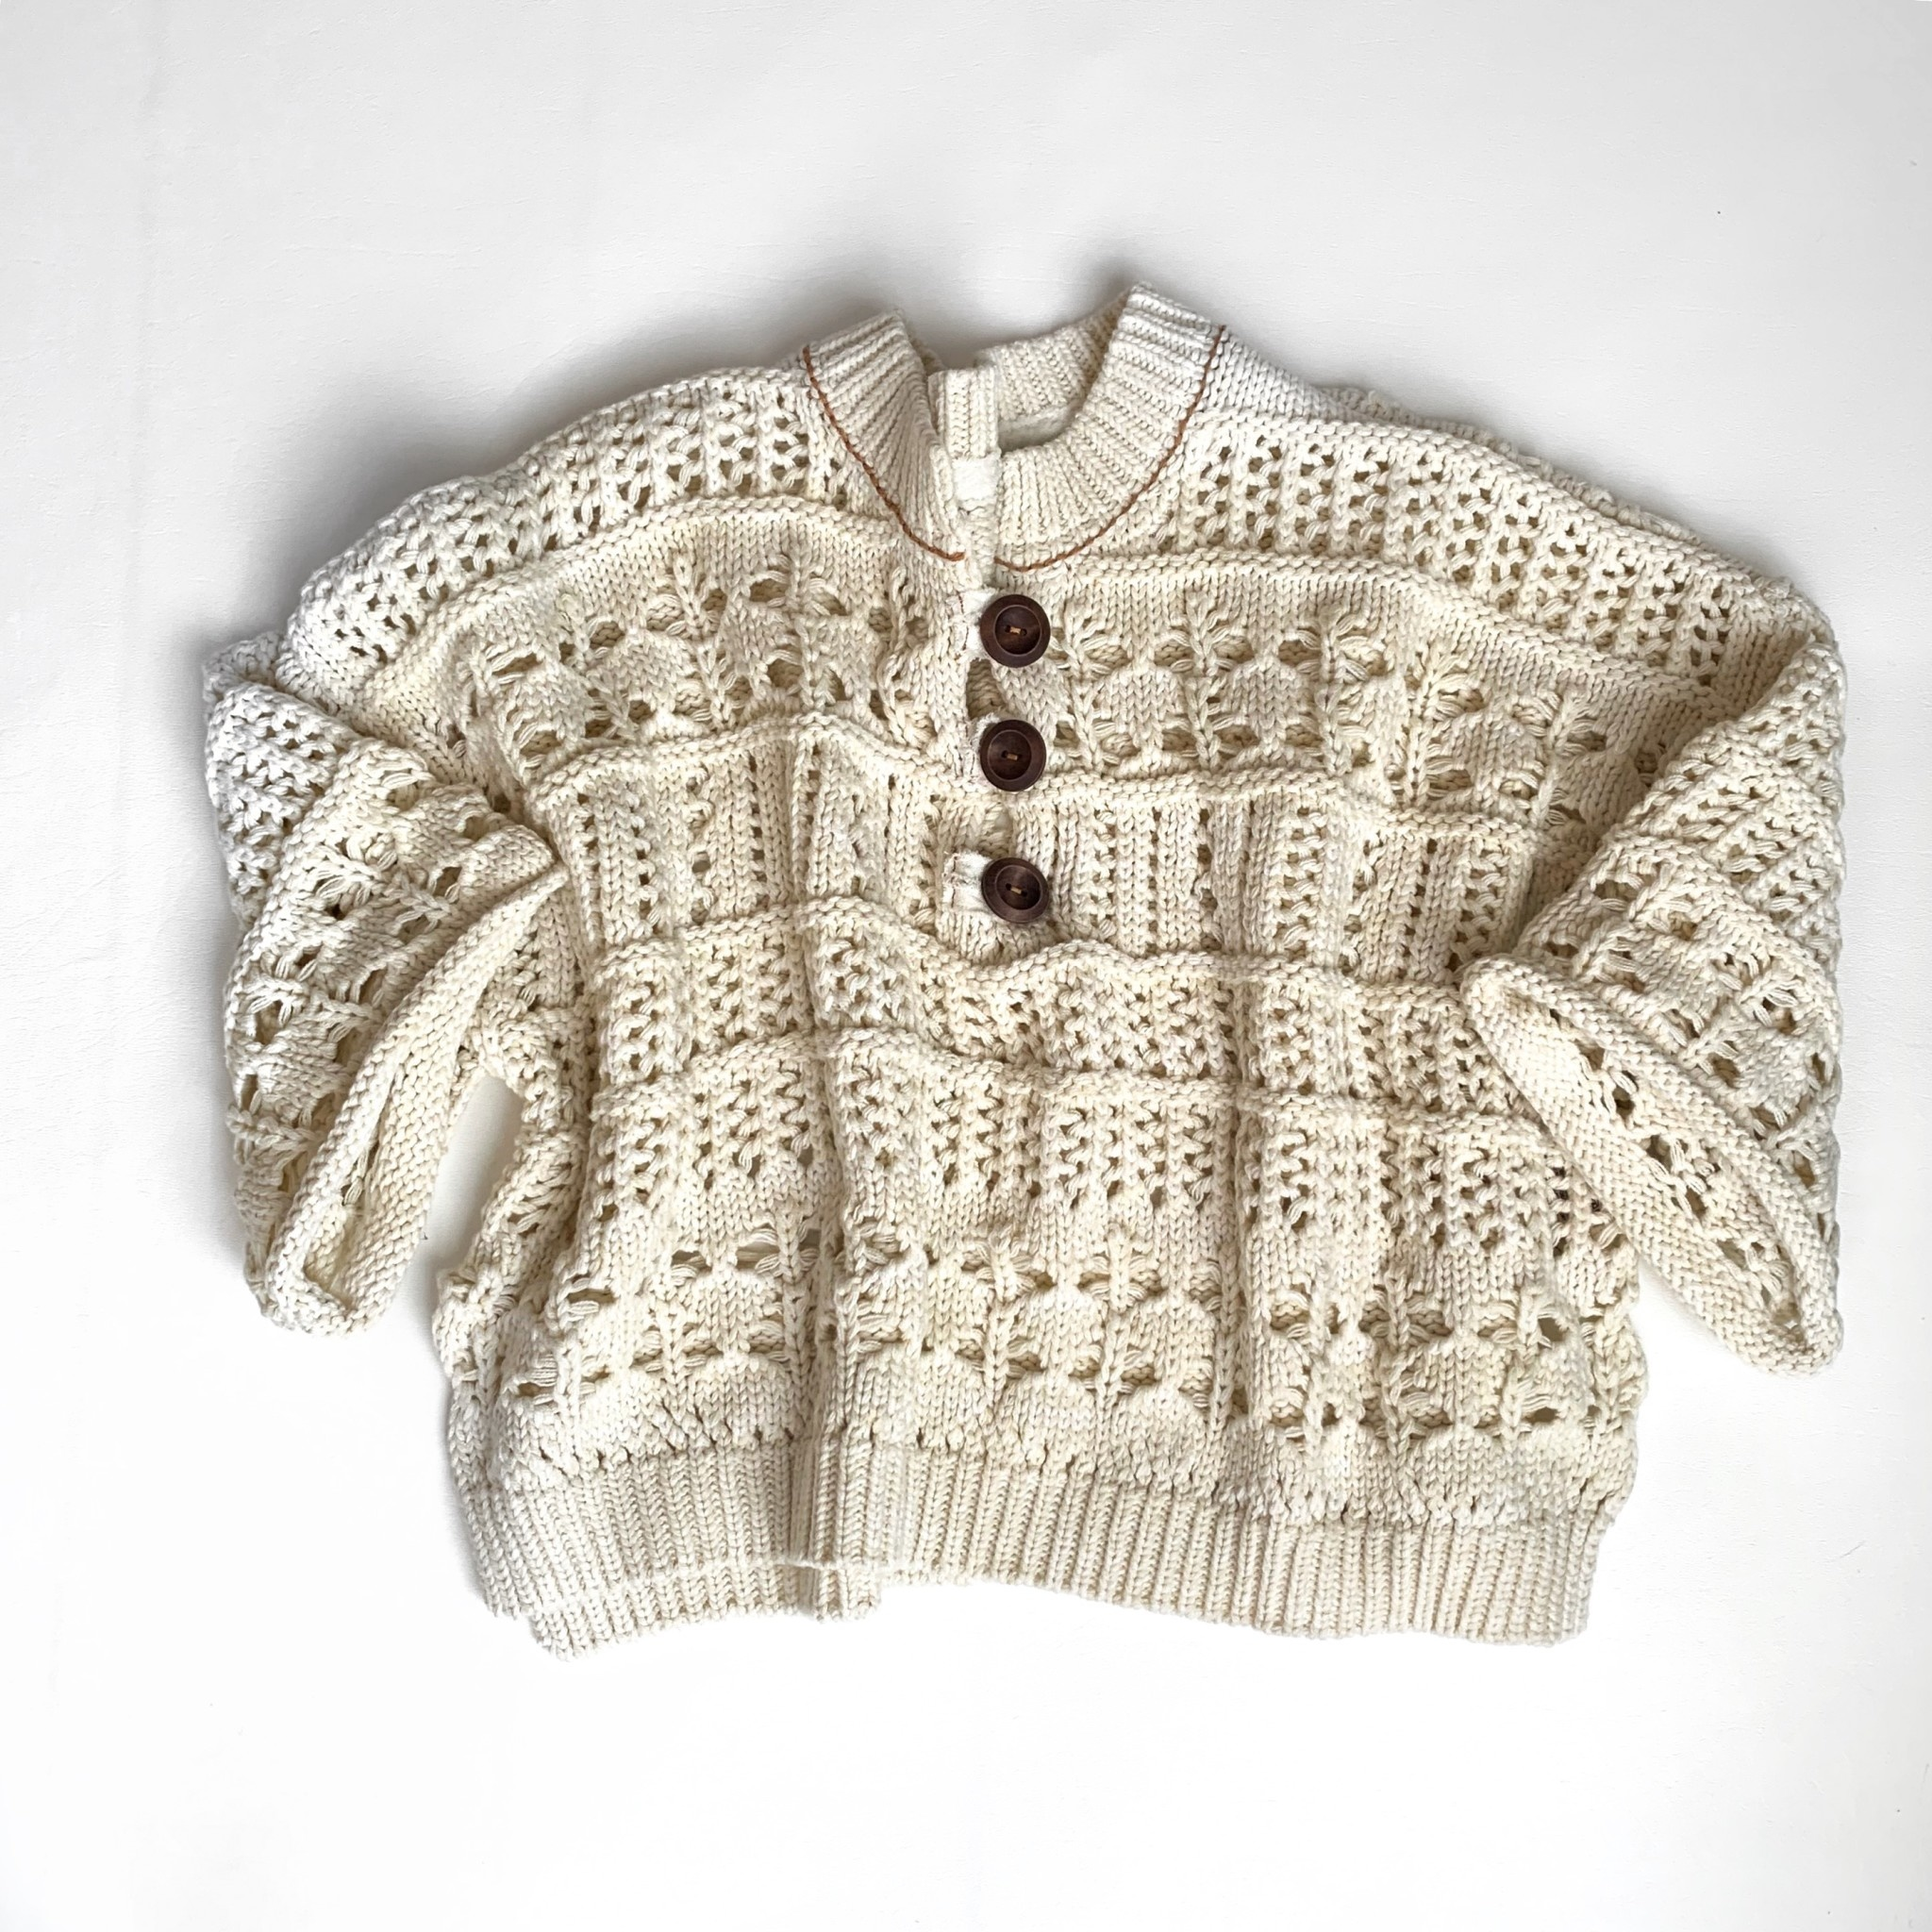 Free People dreams tonight sweater